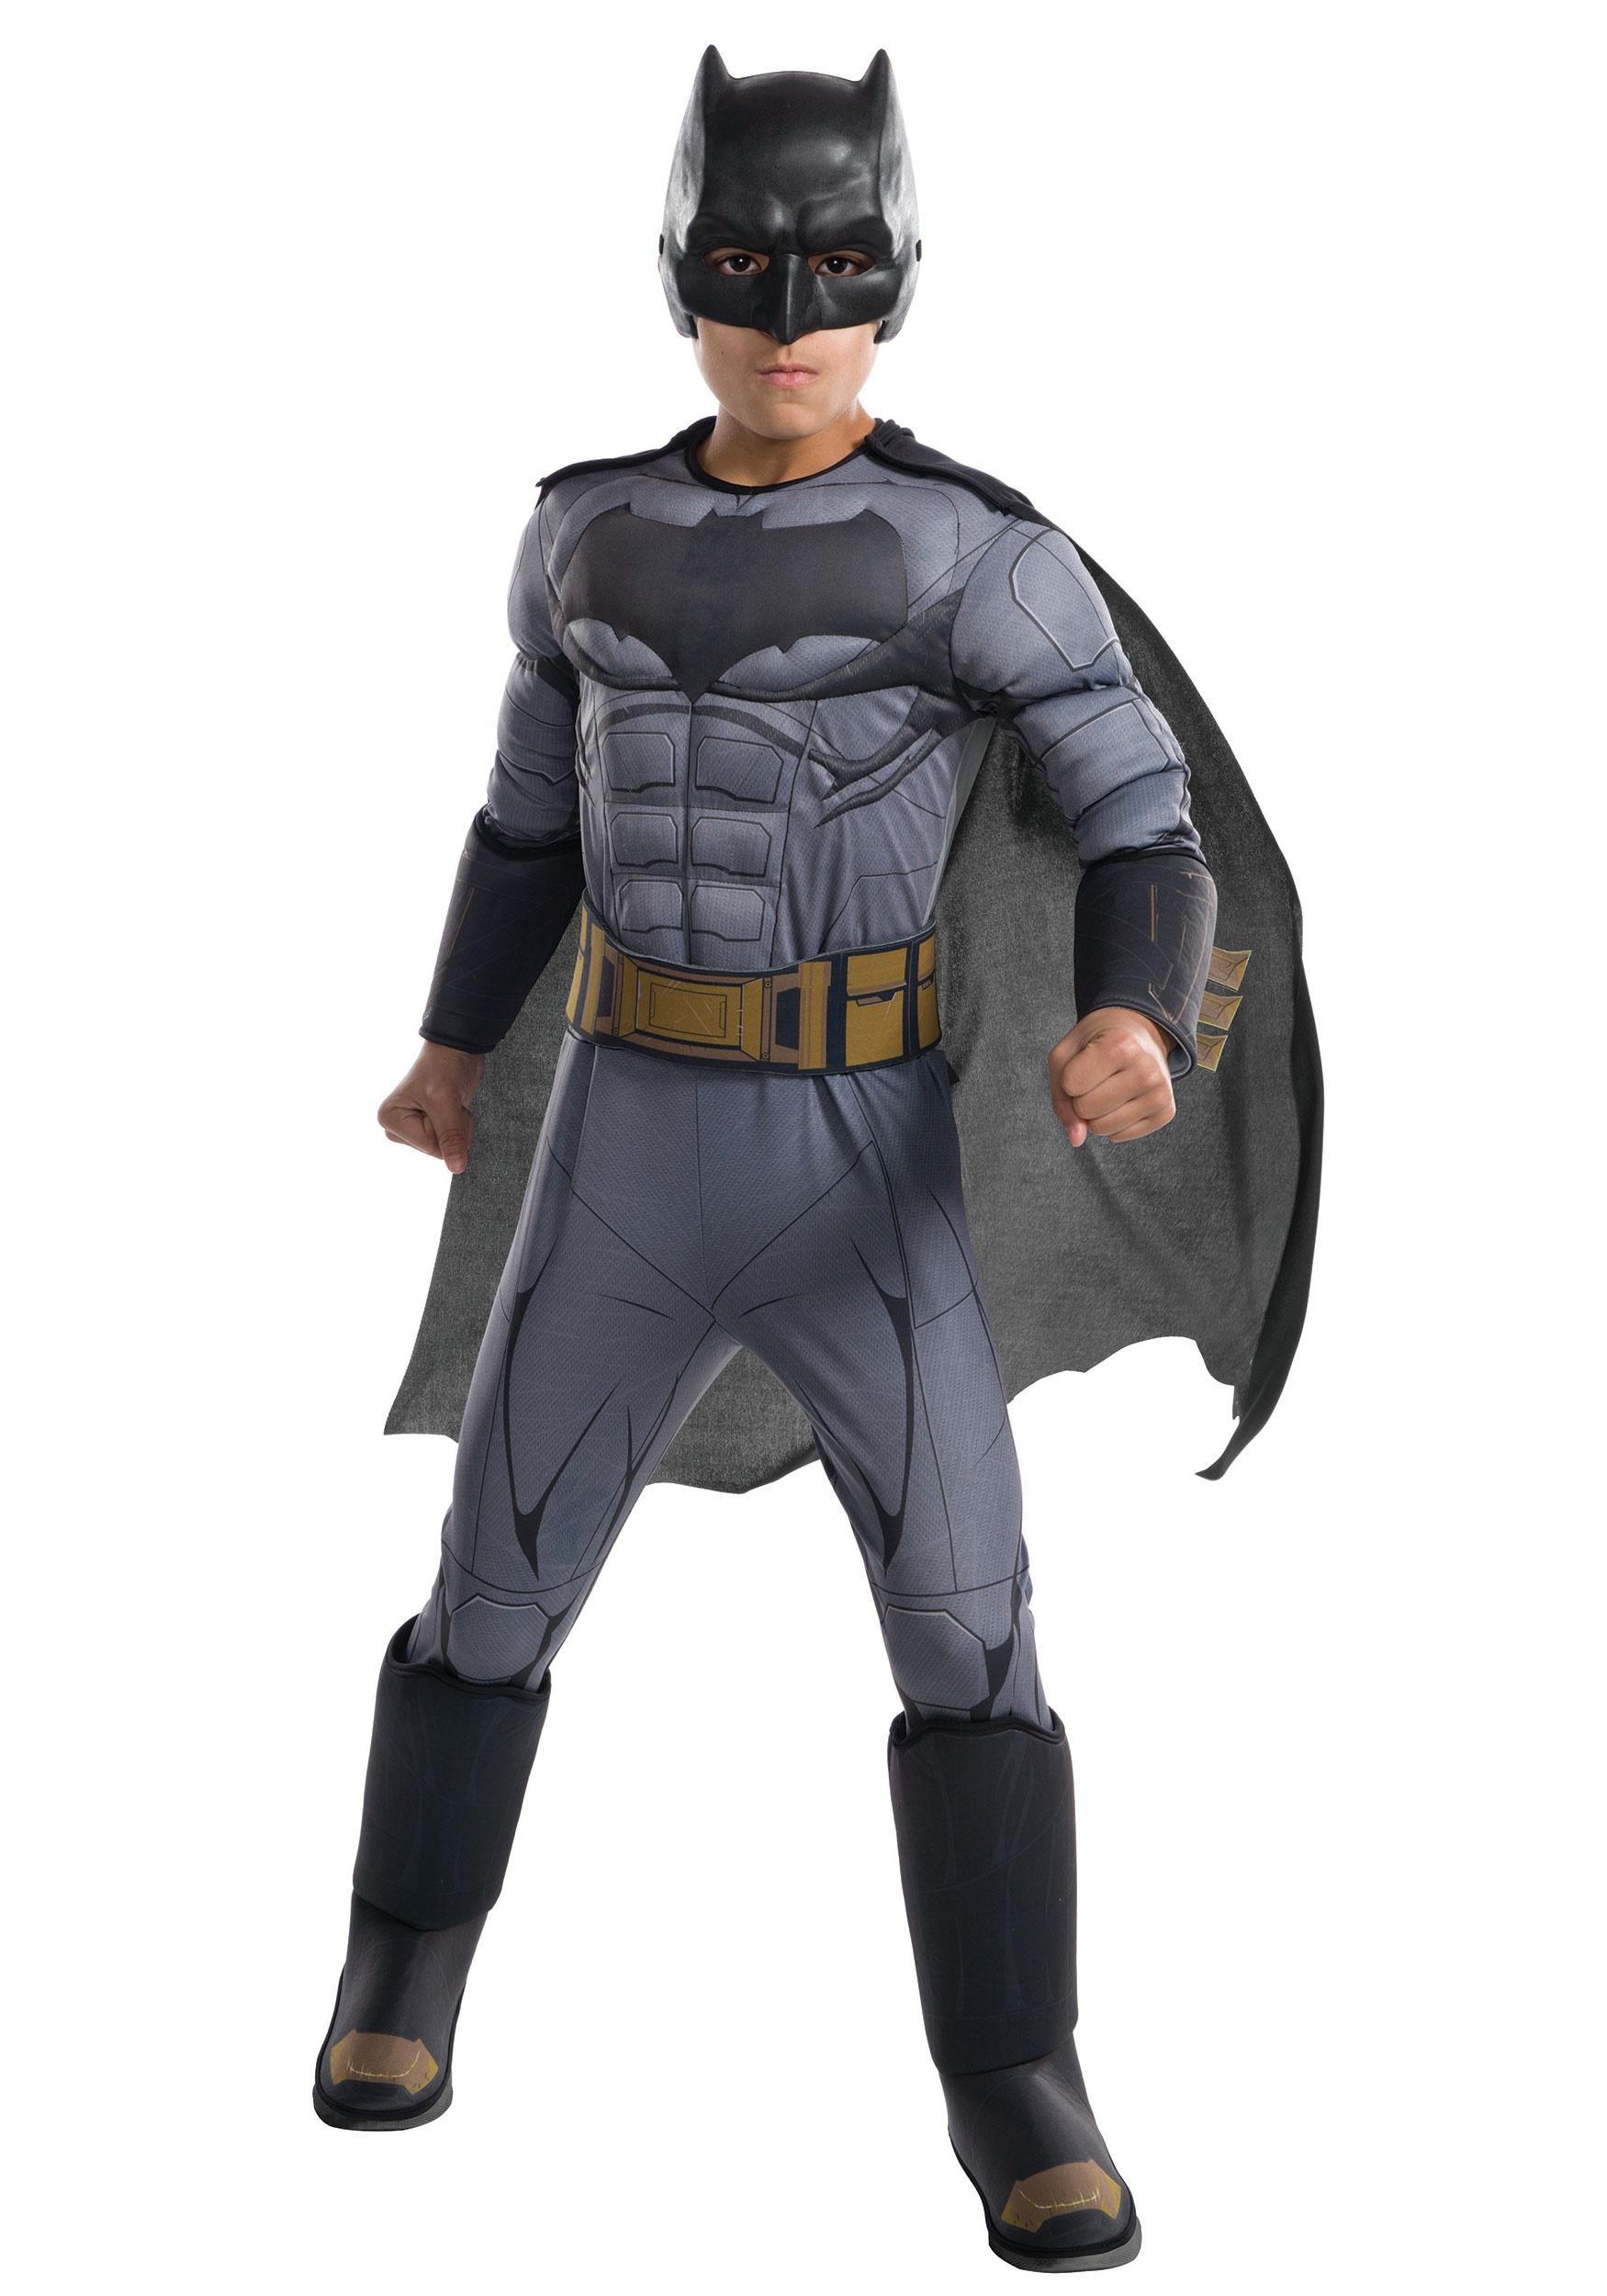 Justice League Deluxe Batman Boys Costume  sc 1 st  Halloween Costumes & Justice League Deluxe Batman Costume for Boys